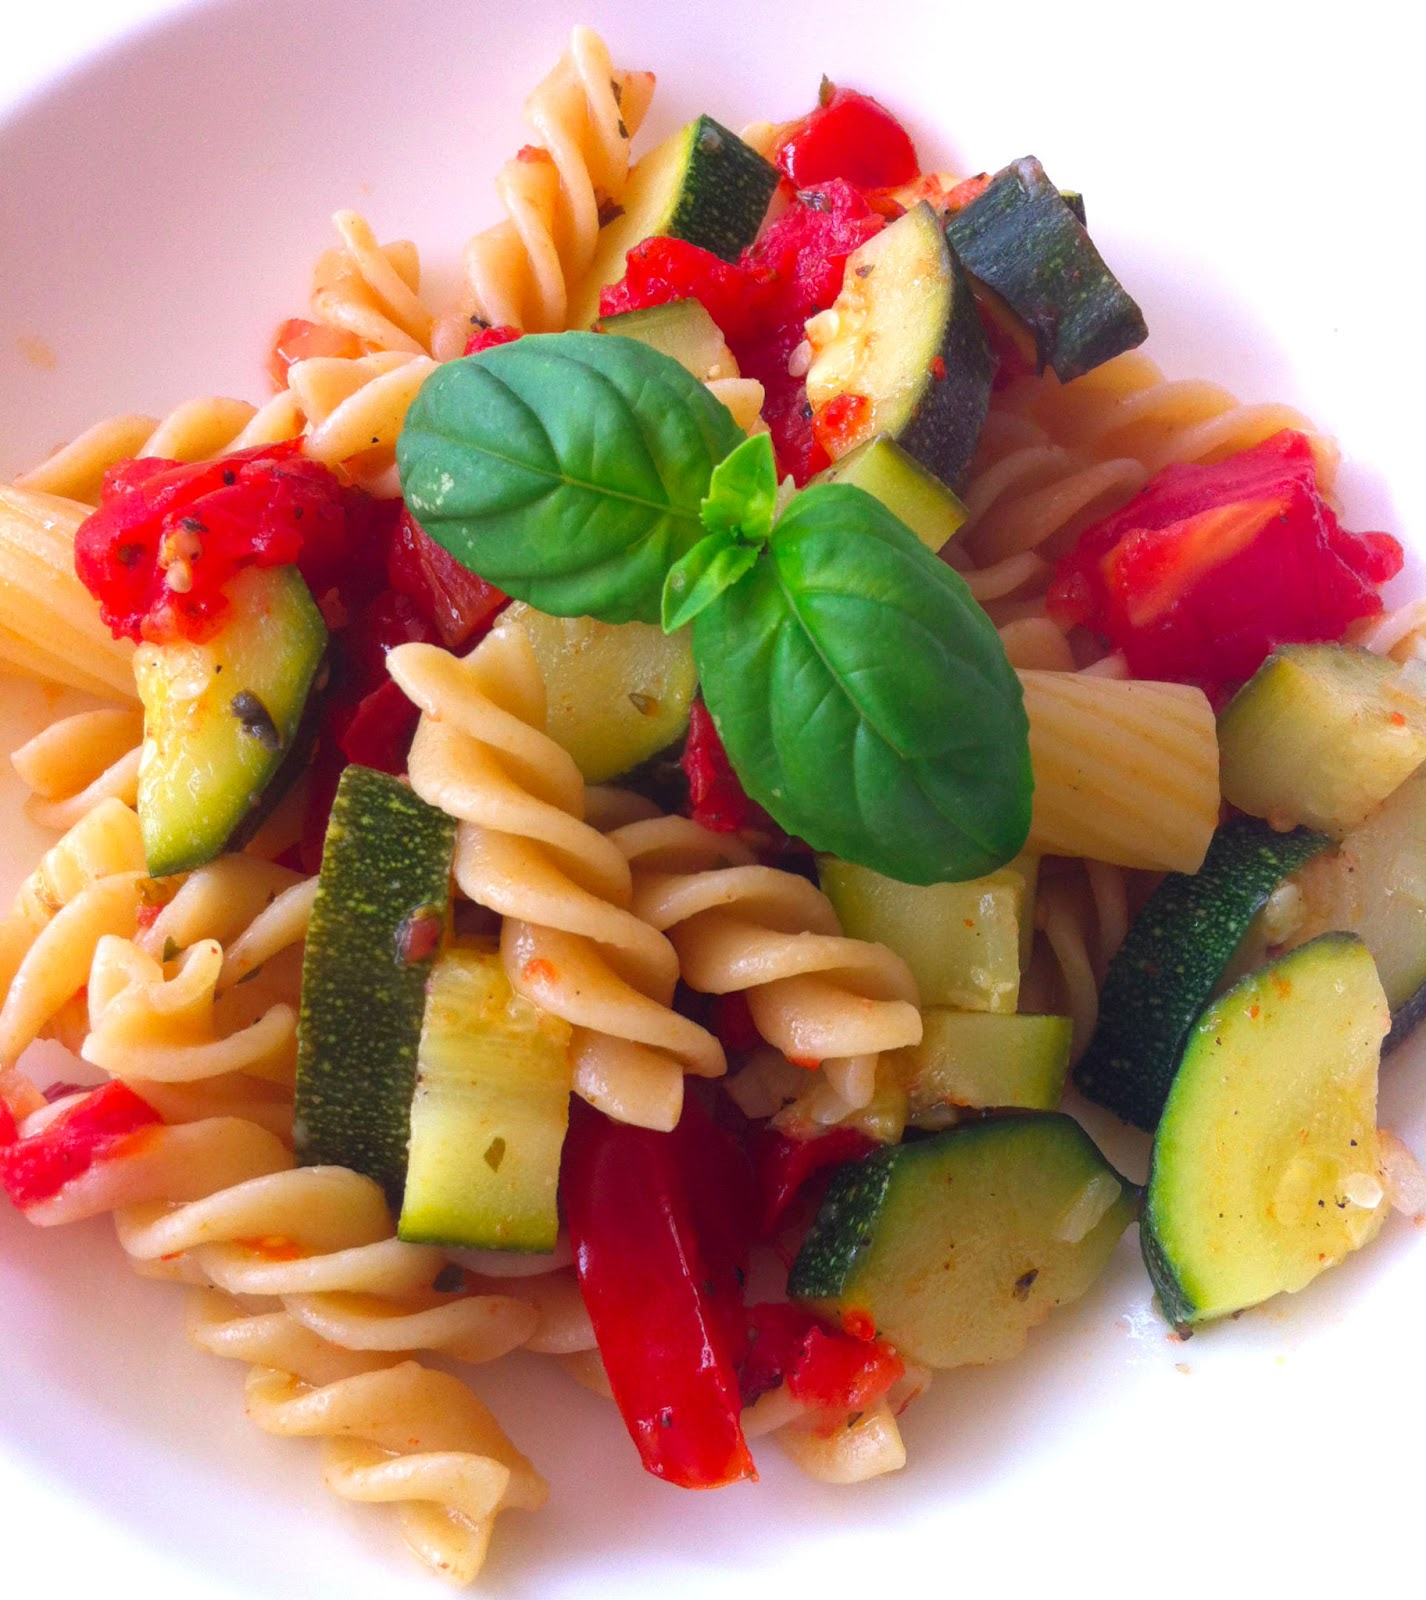 cuisiner bien pasta mit zucchini und tomate. Black Bedroom Furniture Sets. Home Design Ideas